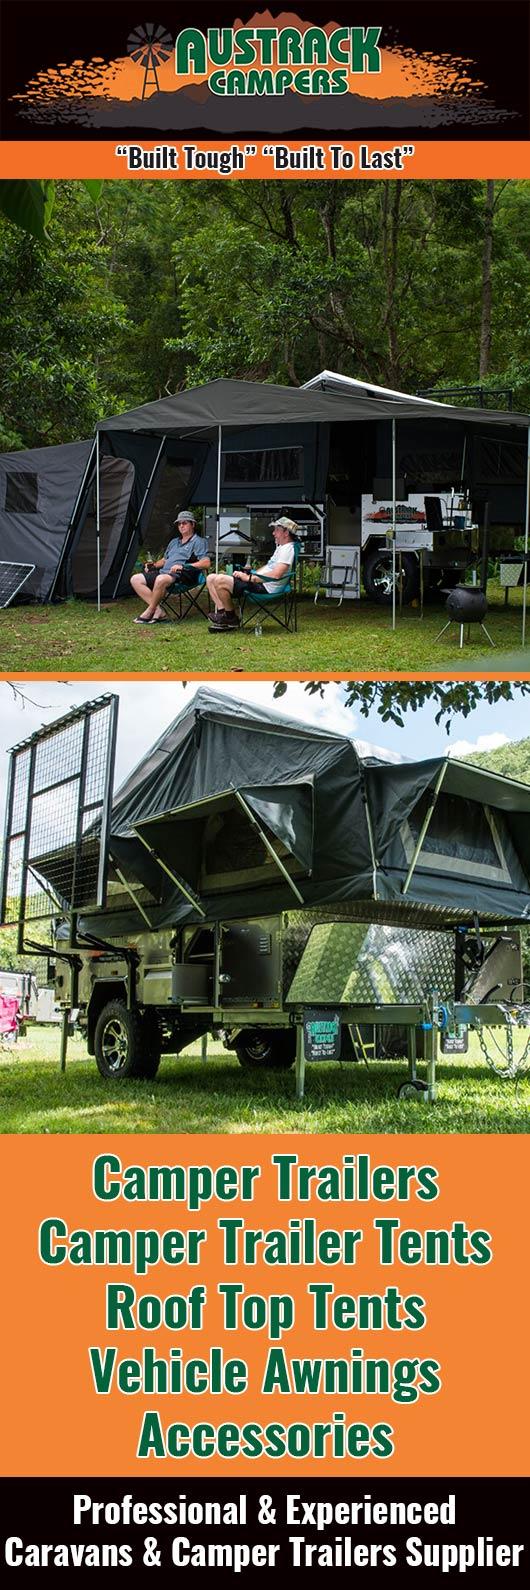 Austrack Campers Camper Trailers Caravans Wangaratta